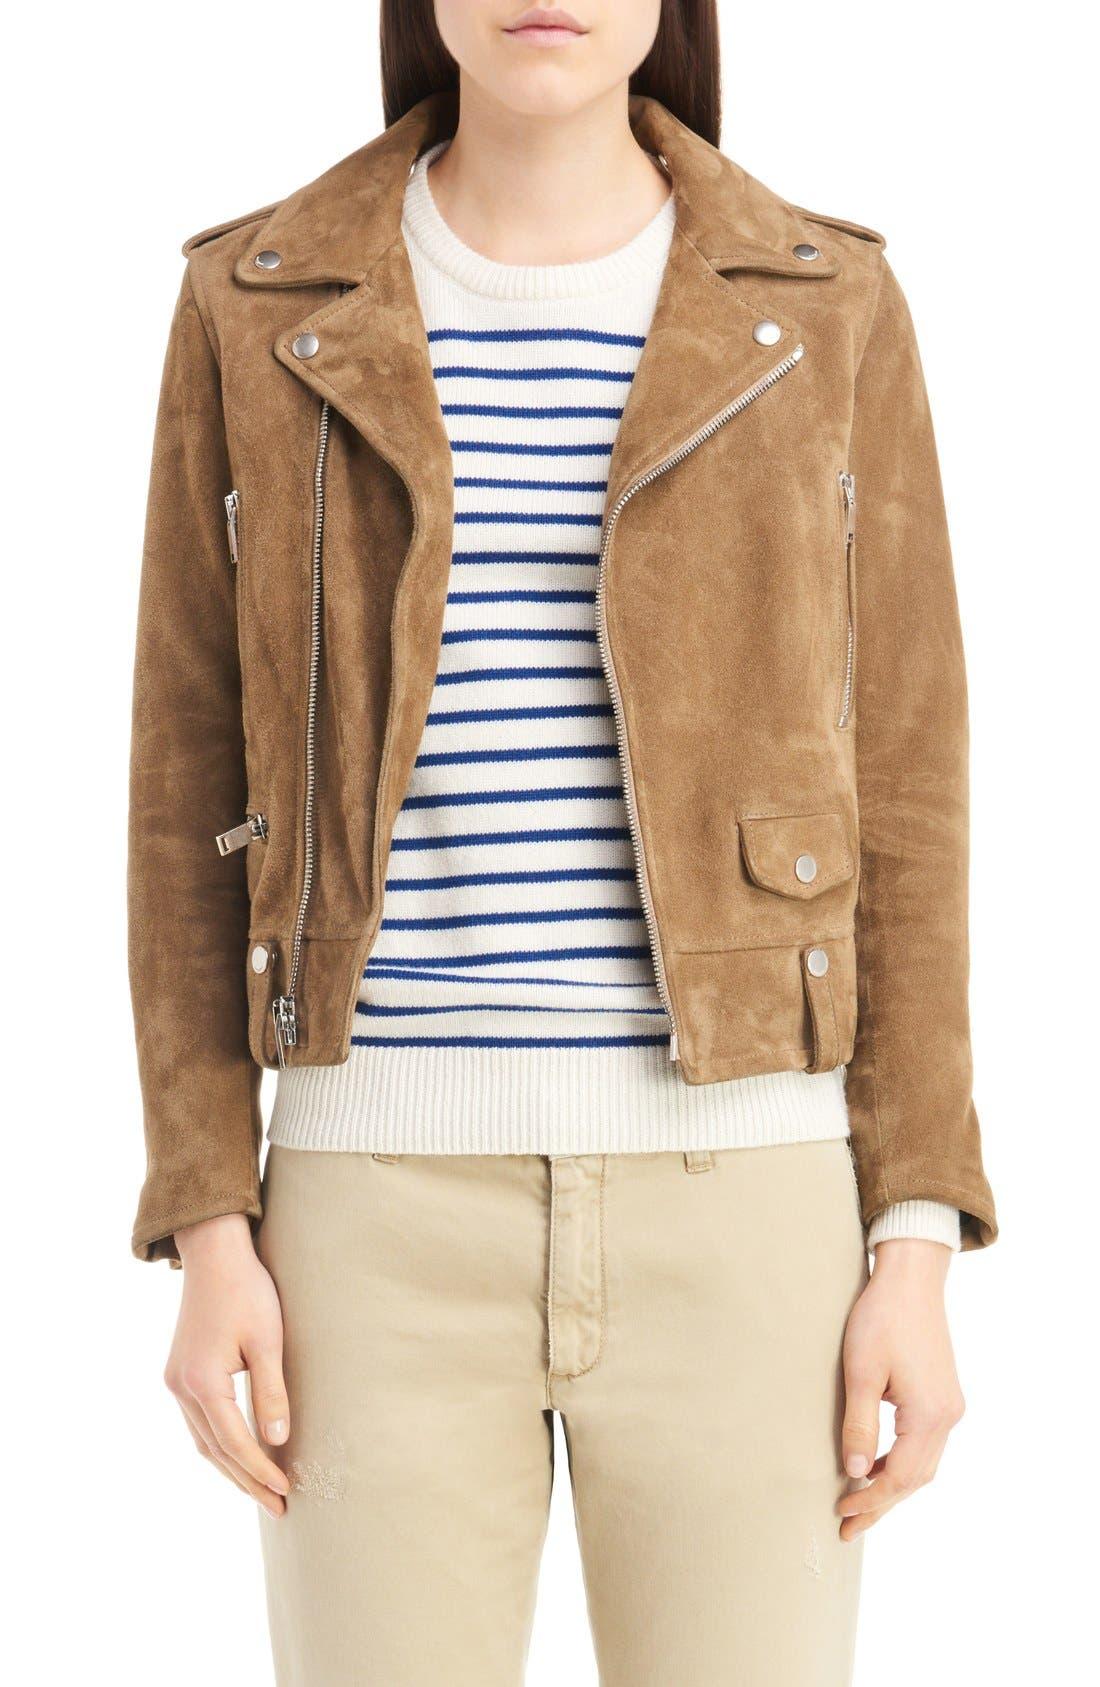 Main Image - Saint Laurent Fringe Suede Moto Jacket